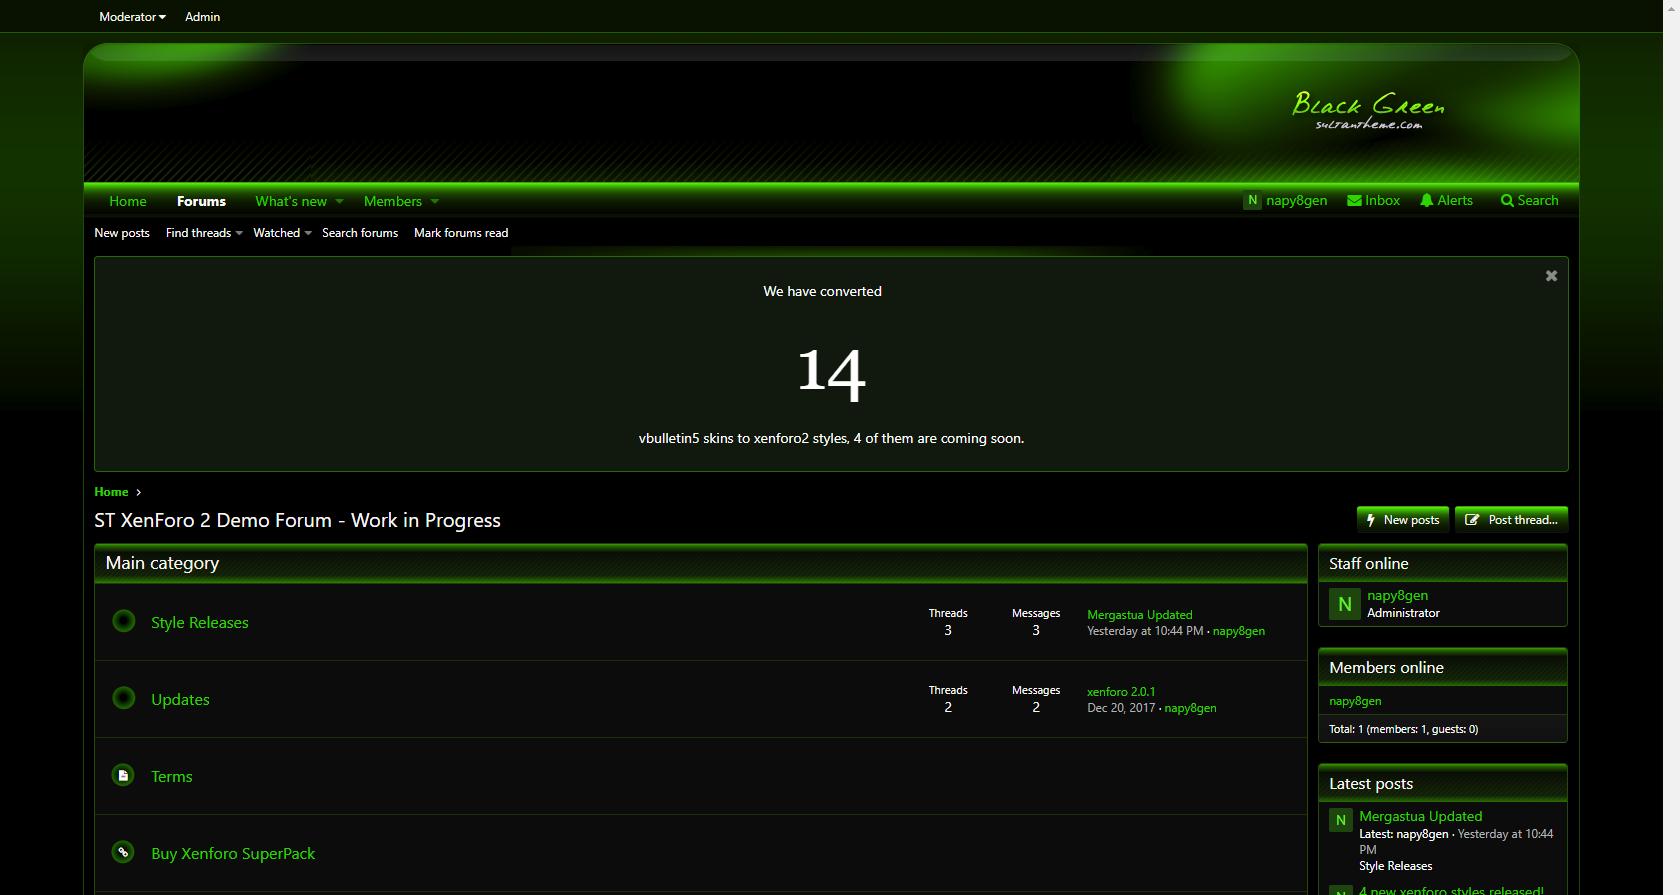 blackgreen 3 - BlackGreen xf2